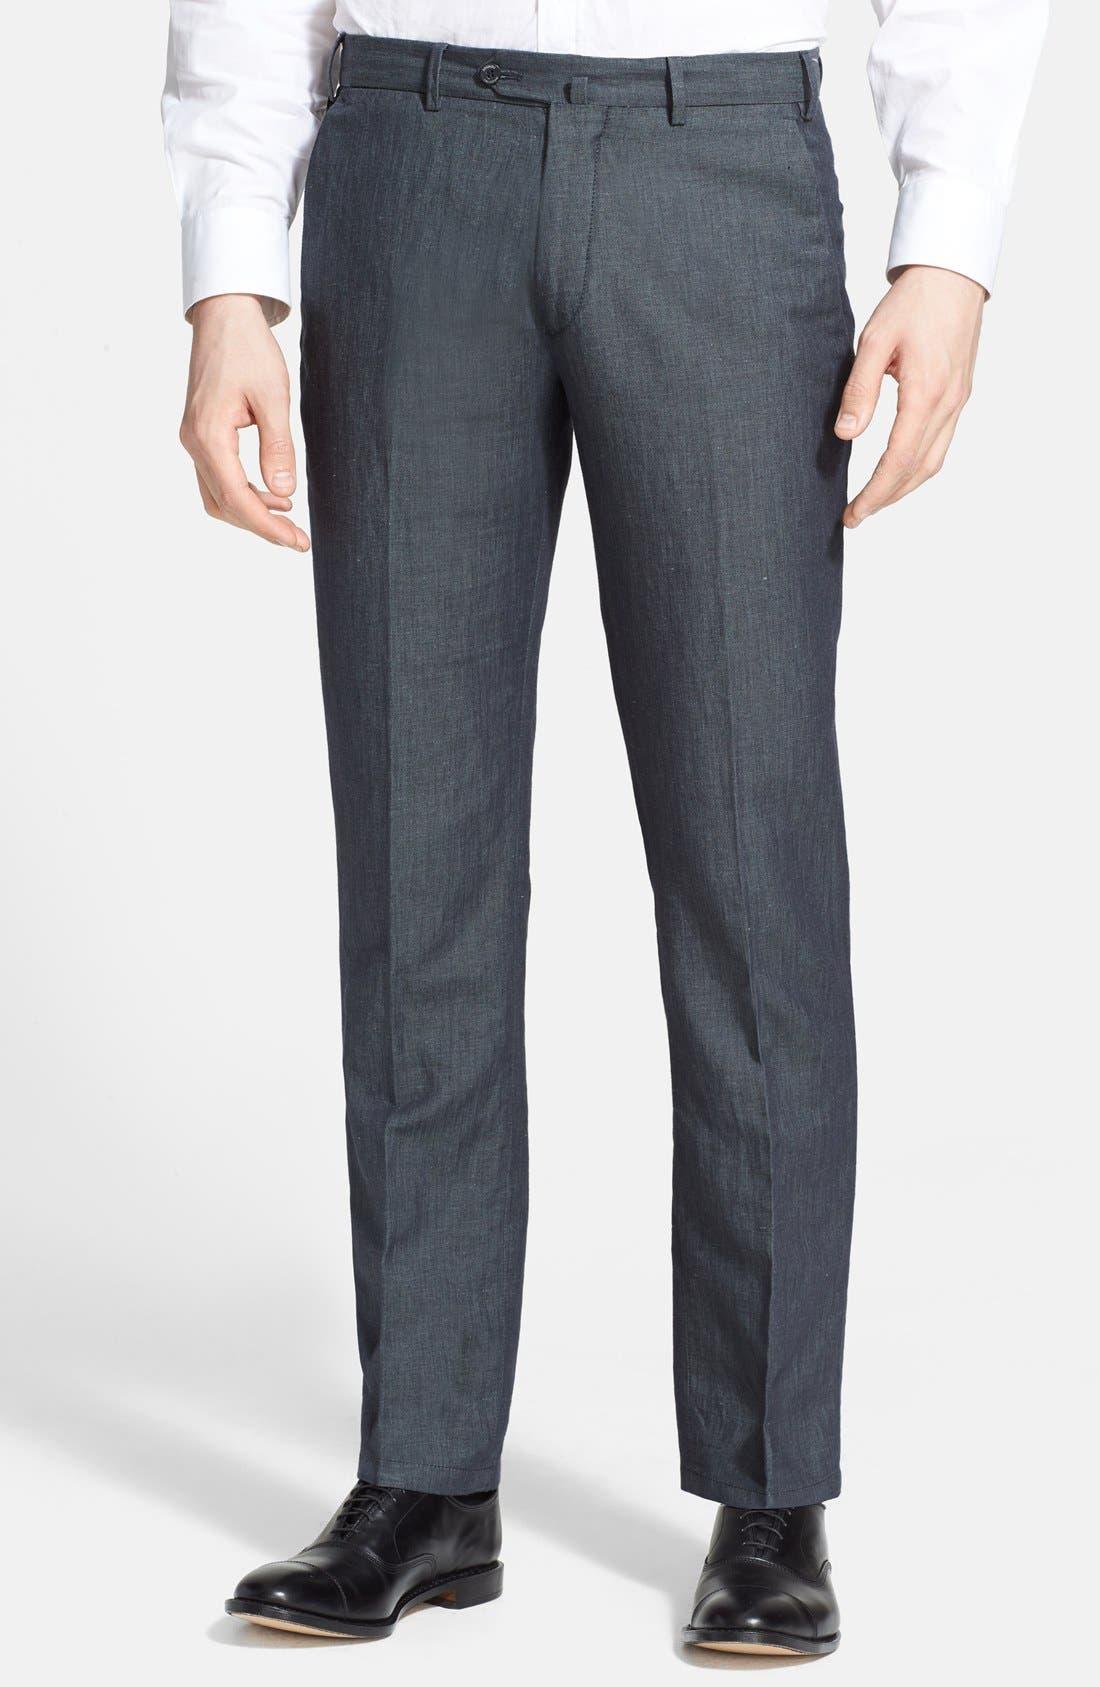 Armani Collezioni Flax & Cotton Flat Front Trousers,                             Main thumbnail 1, color,                             034